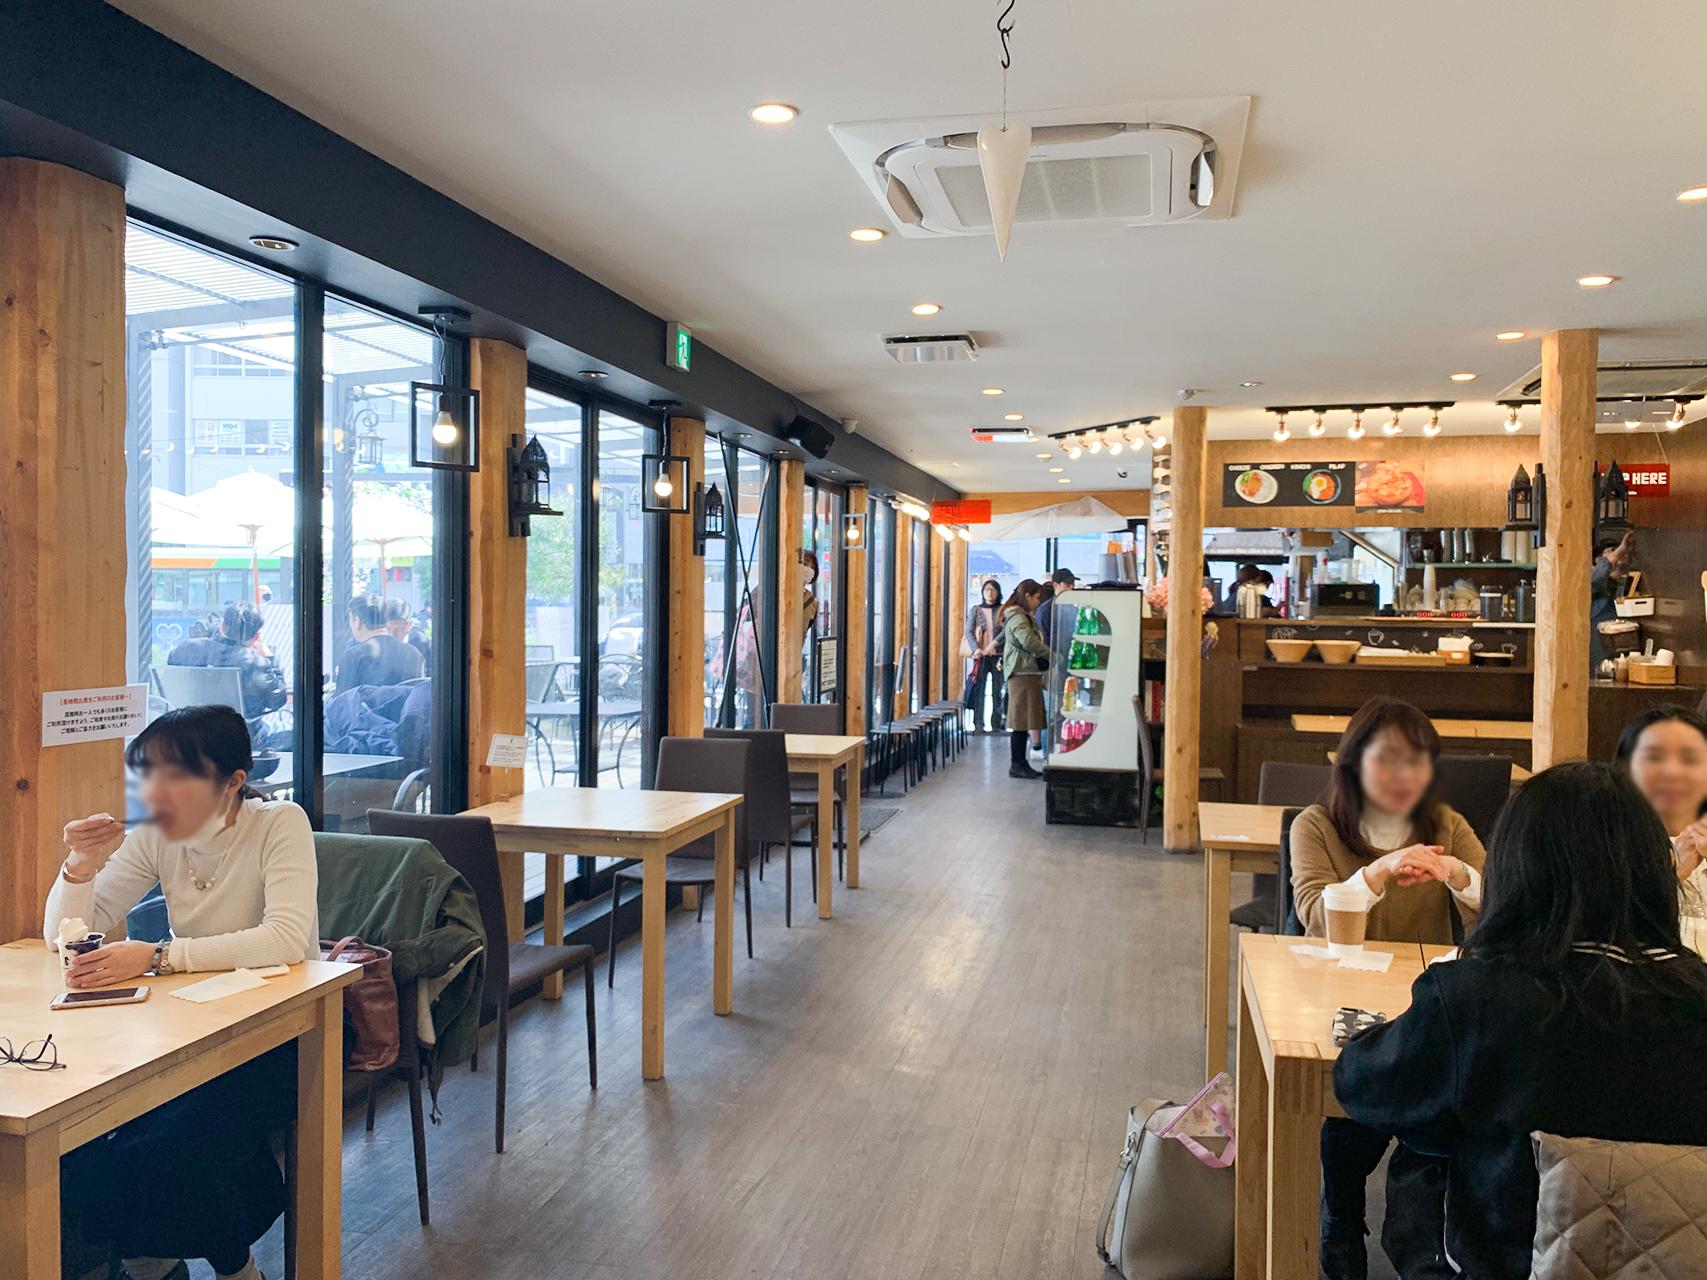 Cafe du Richeの店内はお客さんも多い